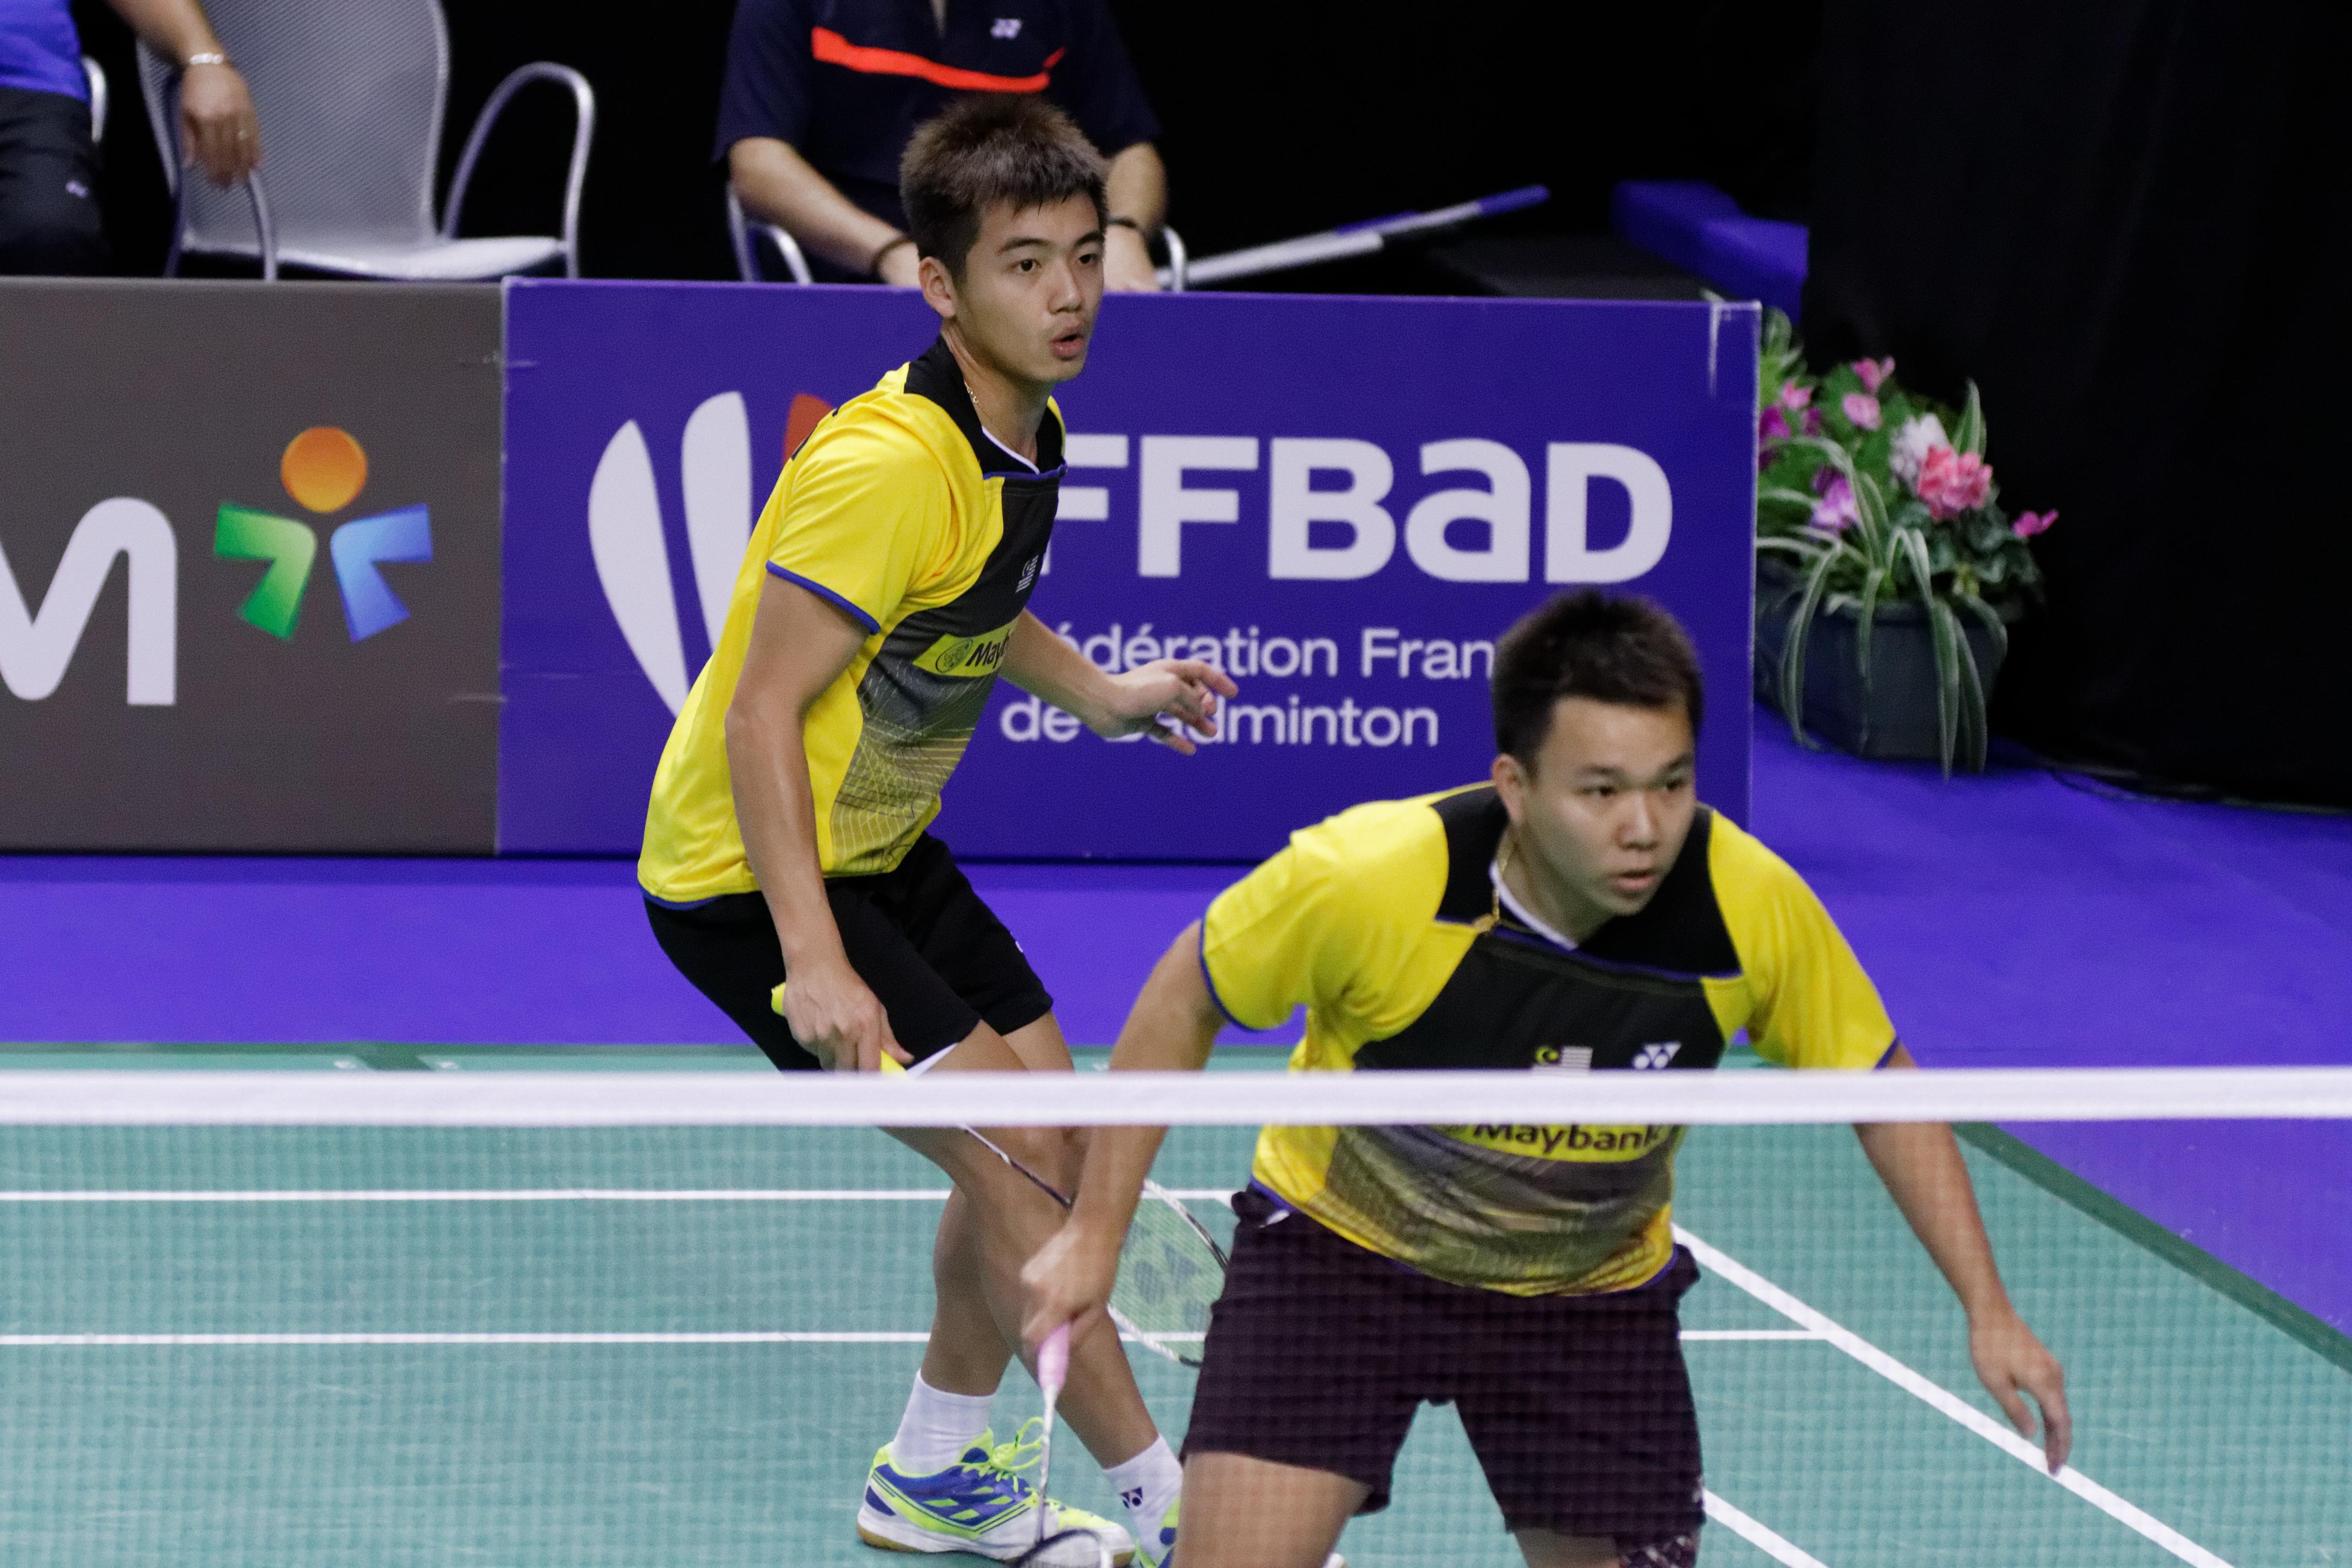 File Yonex IFB 2013 Eightfinal Chan Yun Lung Lee Hei chun